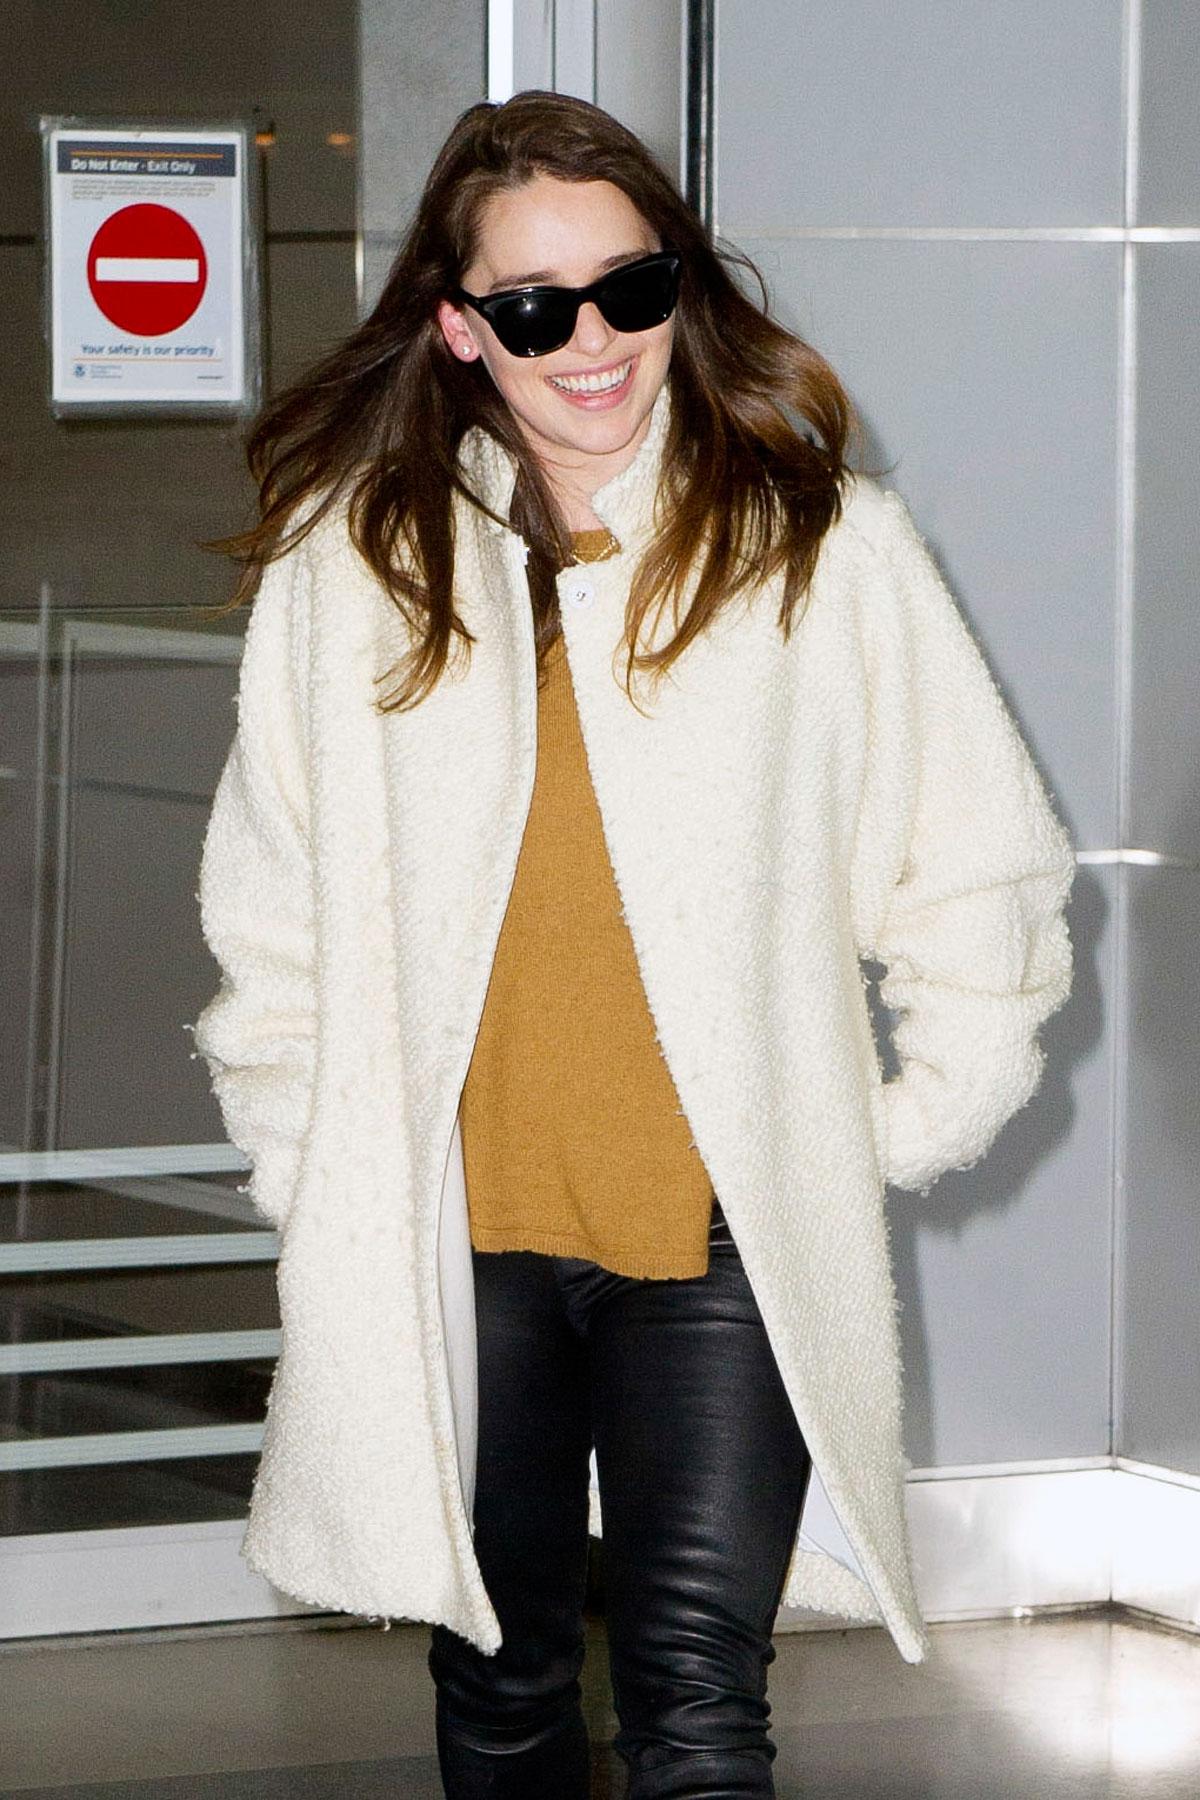 Emilia Clarke arrives at JFK airport